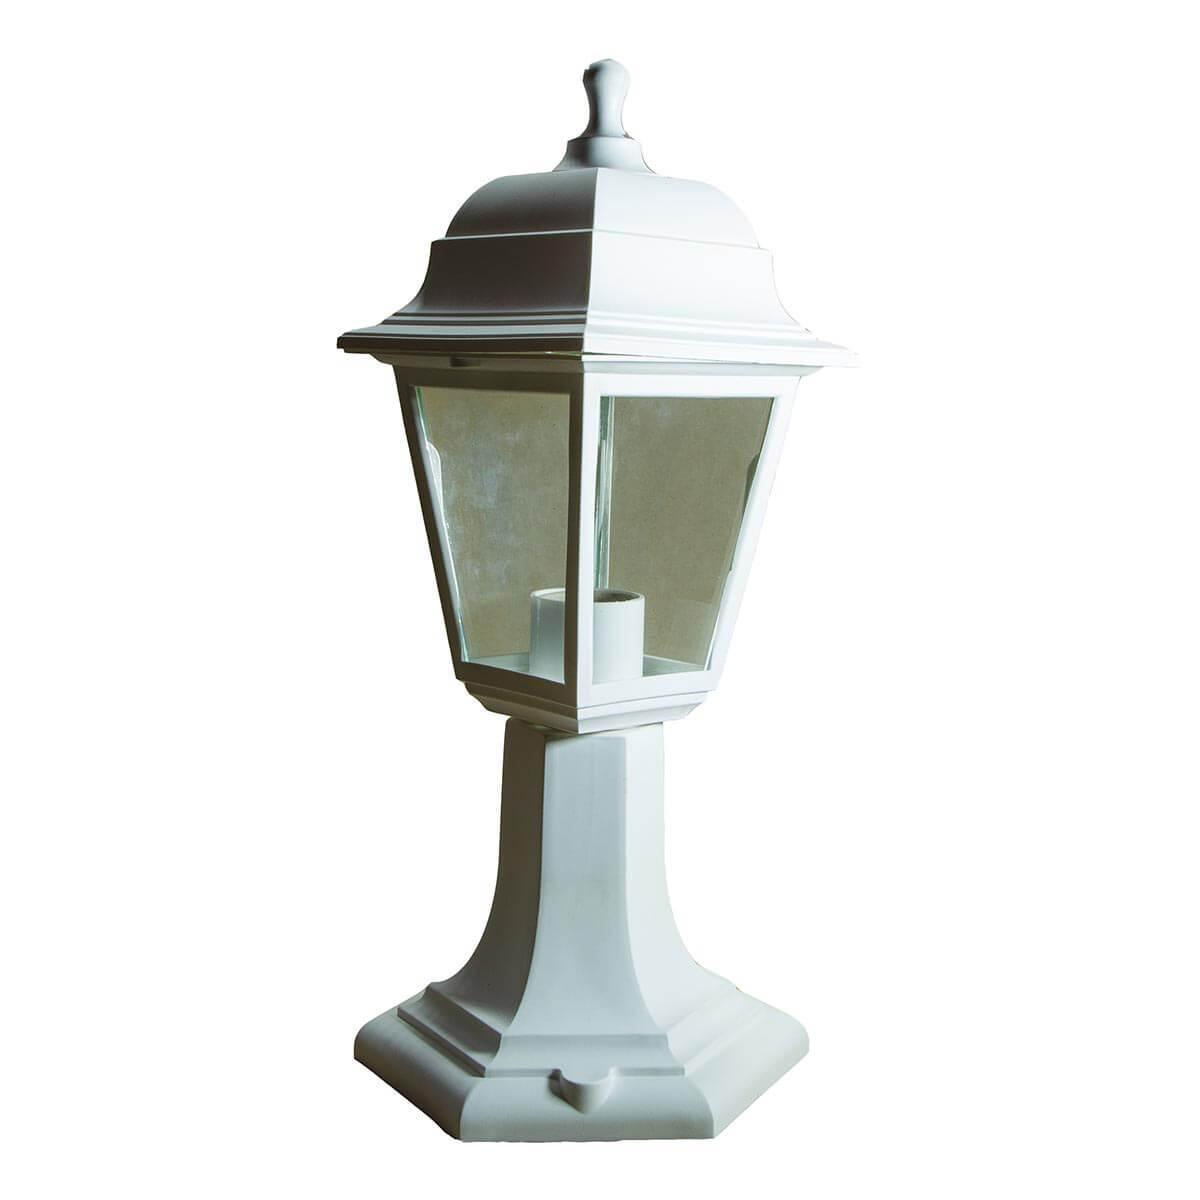 Уличный светильник ЭРА Оскар белый НТУ 04-60-001 Б0048101